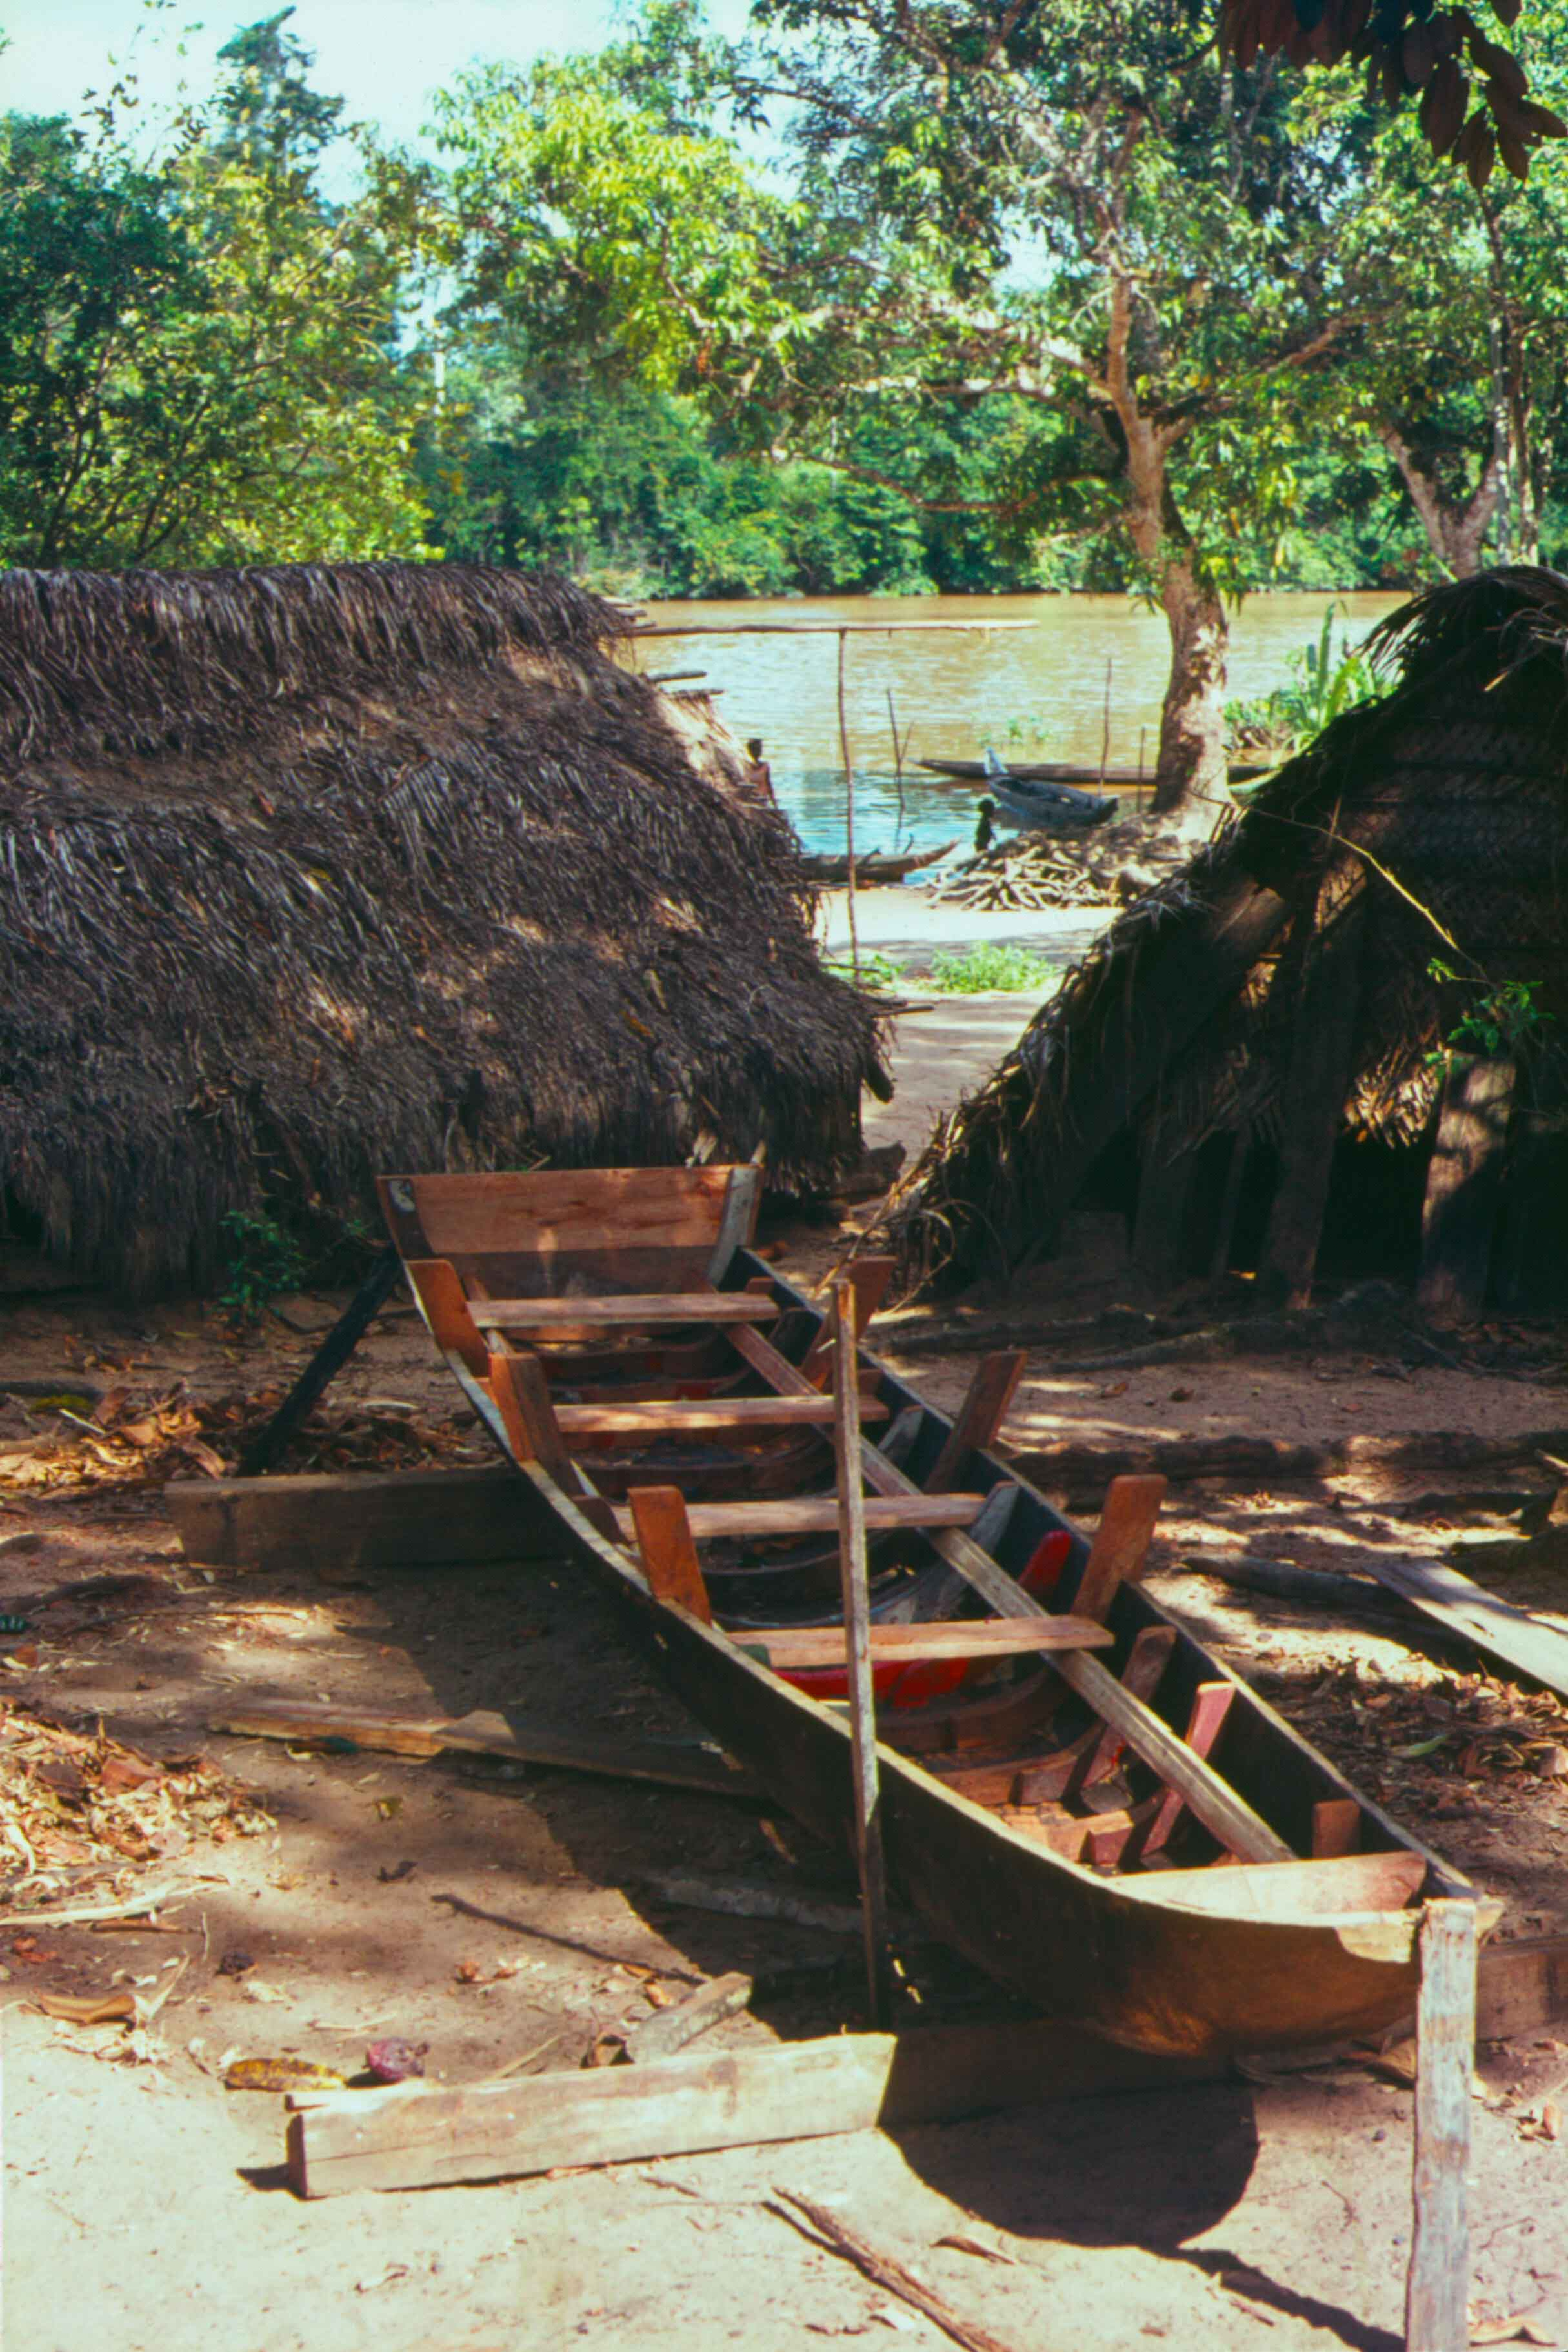 536. Suriname